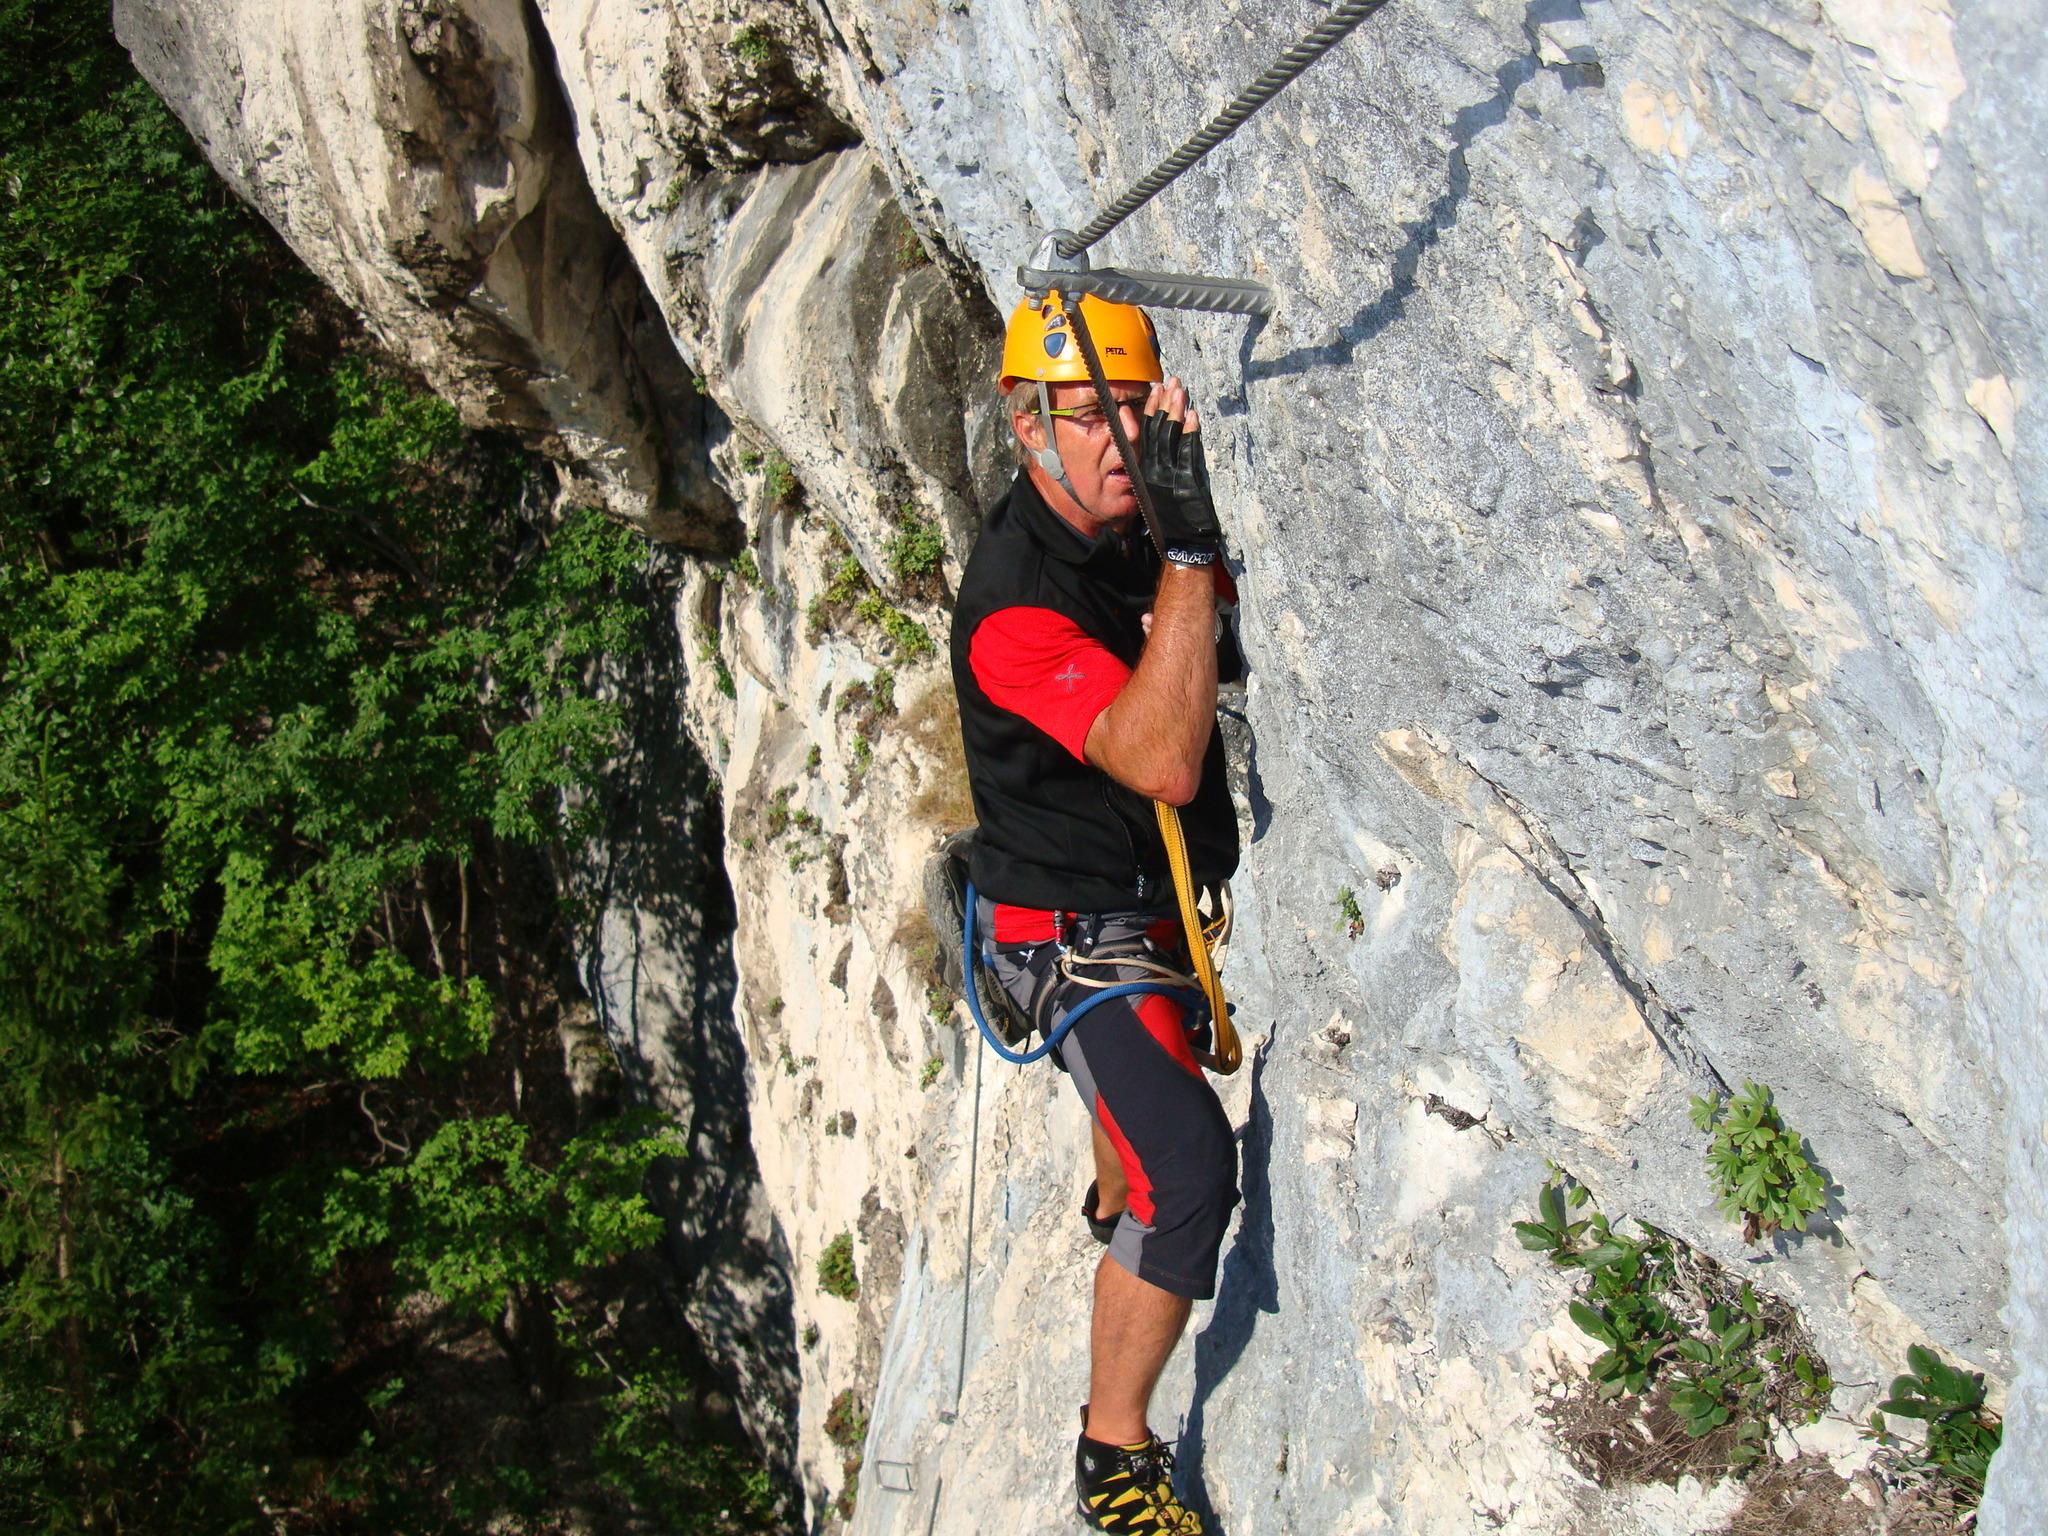 Klettersteig Bandschlinge : Klettersteig am türkenkopf völkermarkt